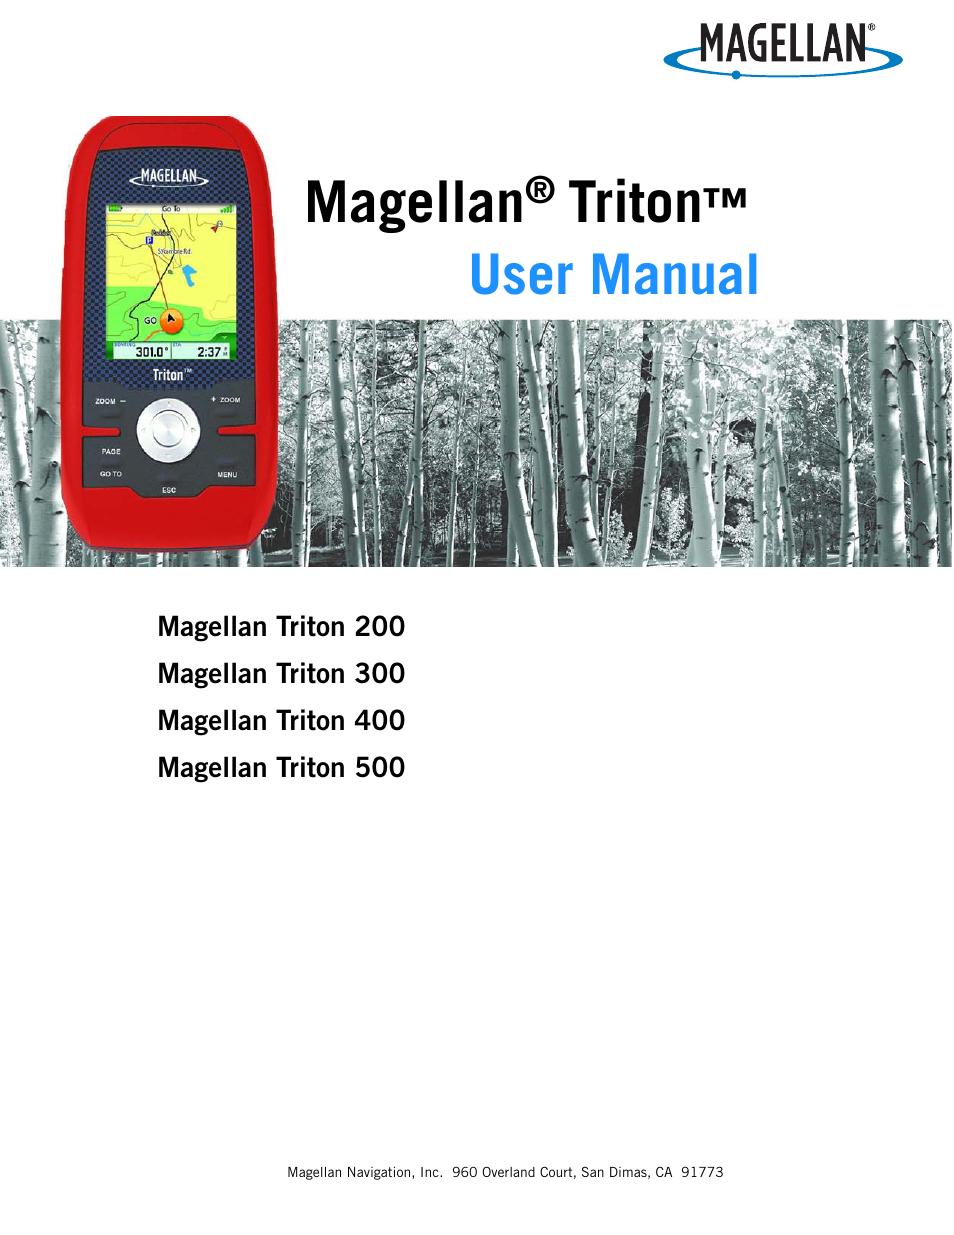 magellan triton 300 user manual 30 pages also for triton 400 rh manualsdir com Magellan Triton 300 GPS Magellan Triton 500 GPS